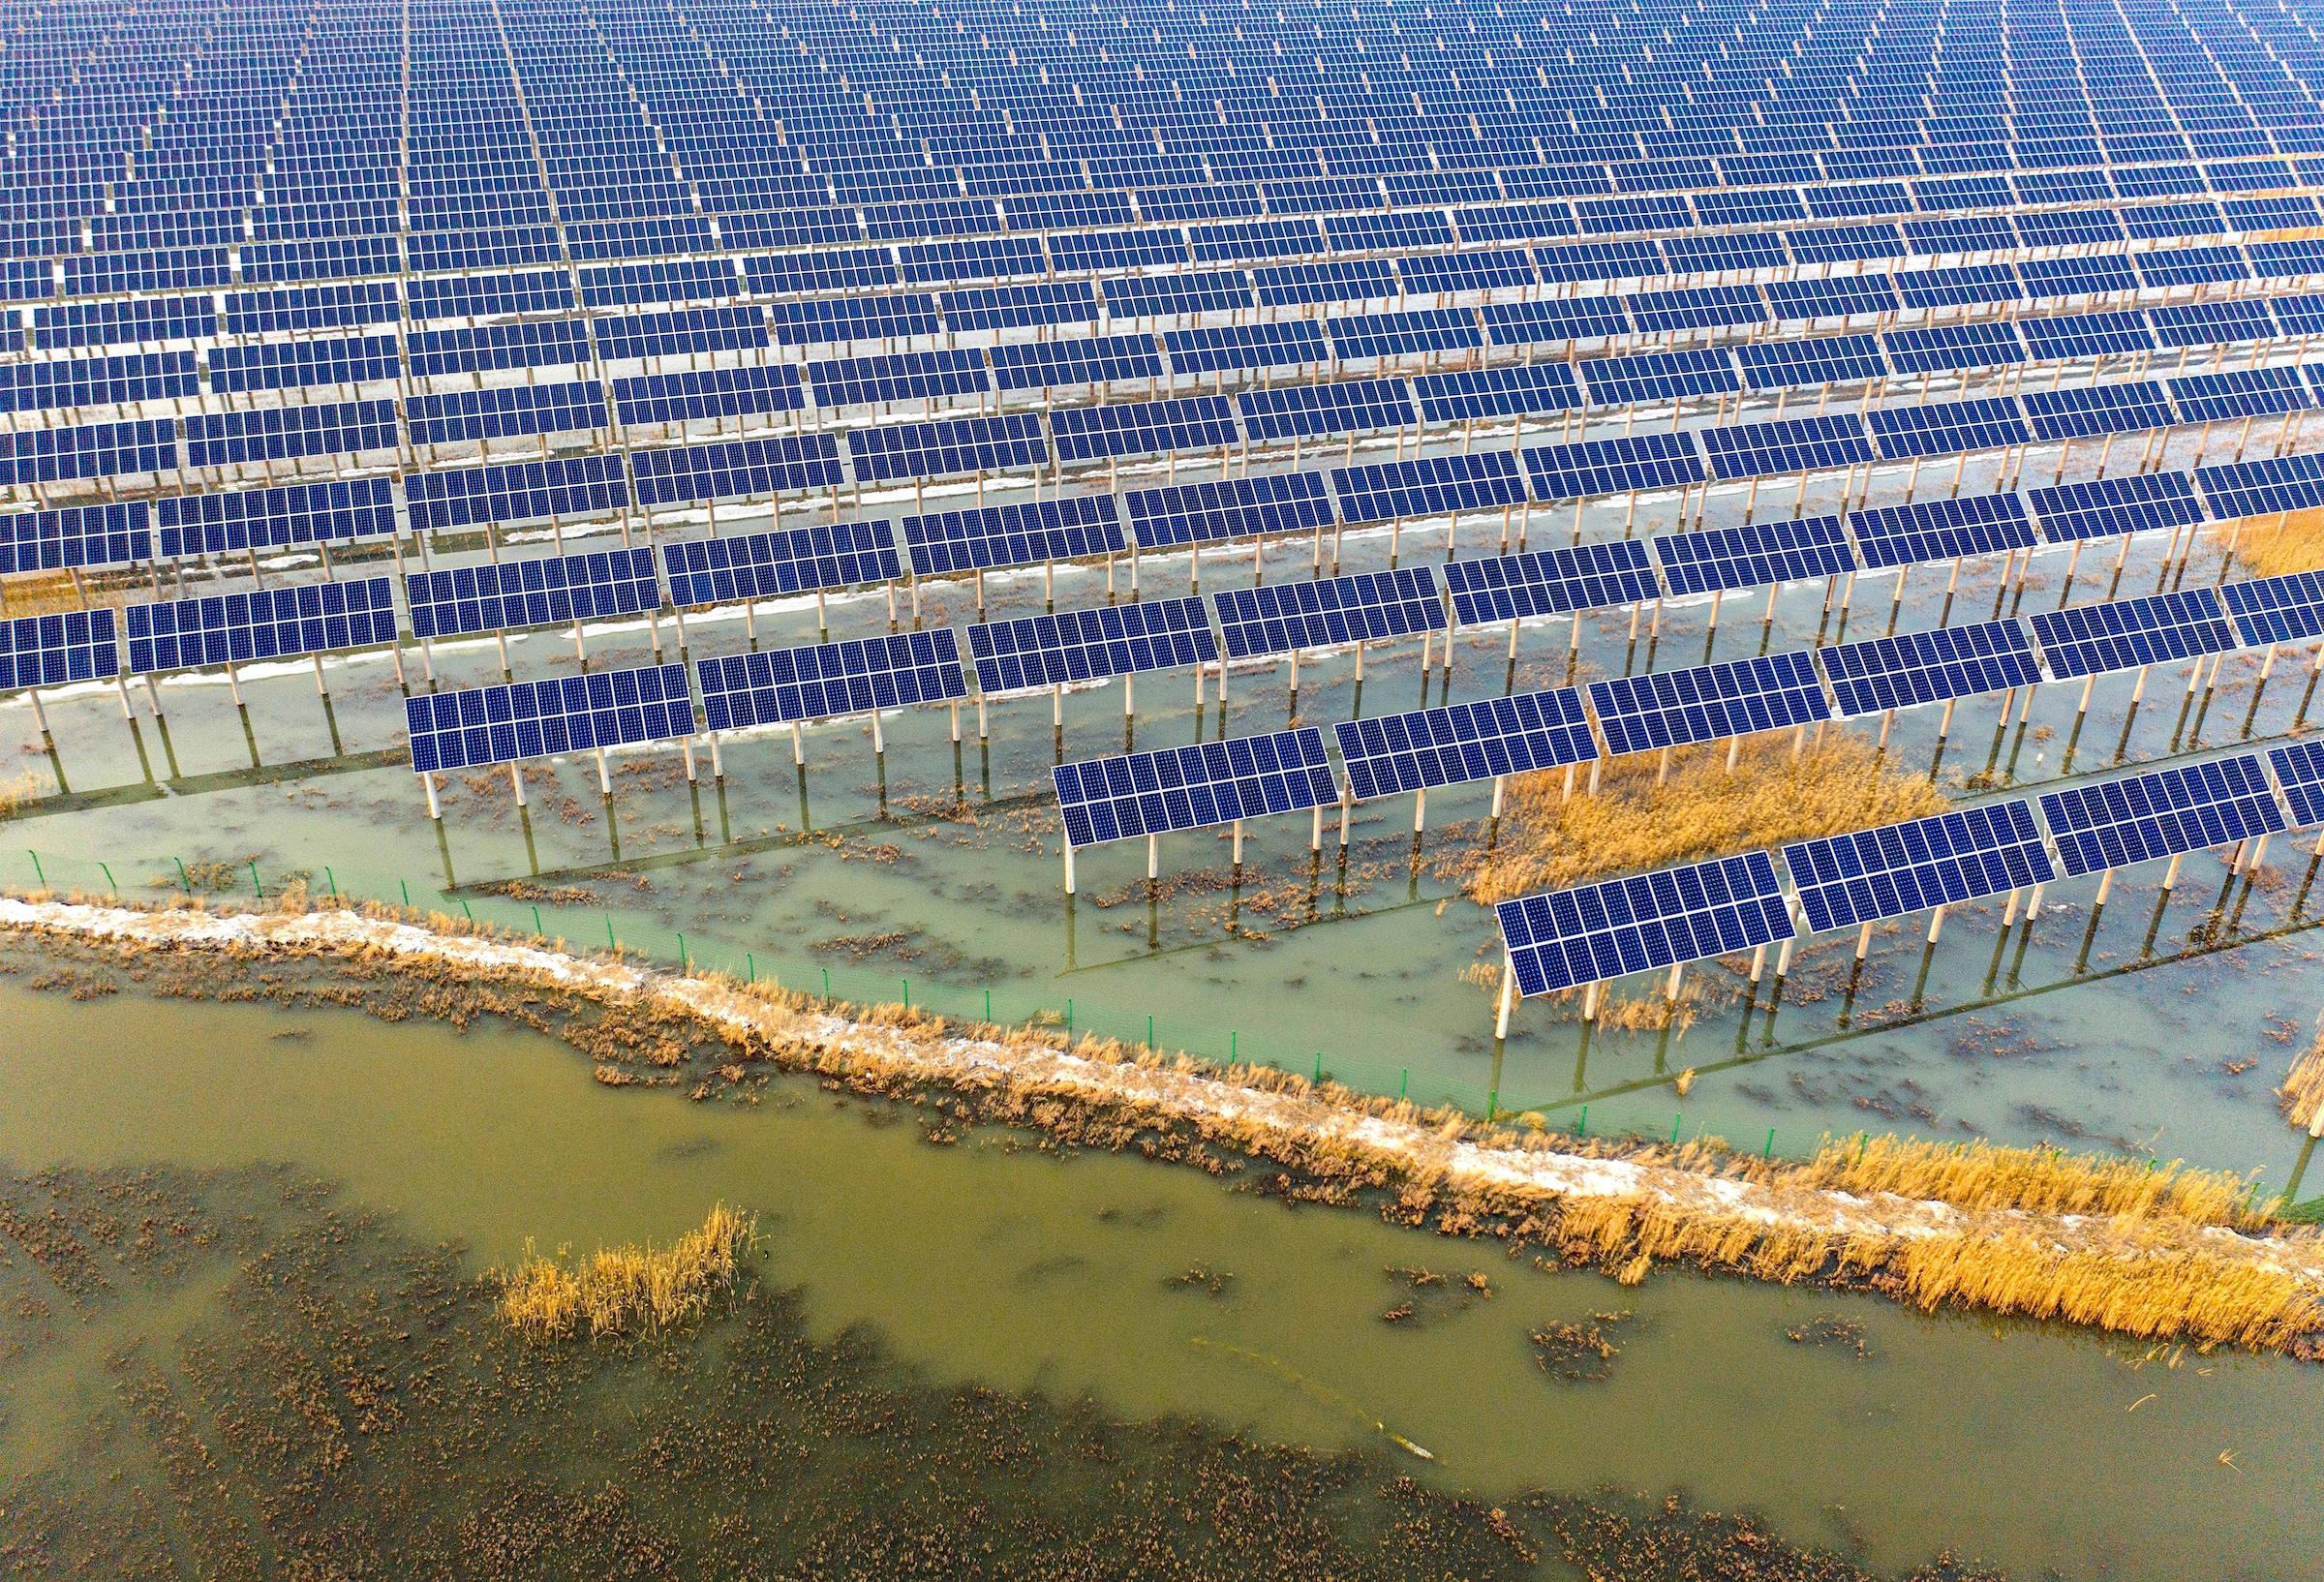 Despite coronavirus, China aims for renewables grid parity